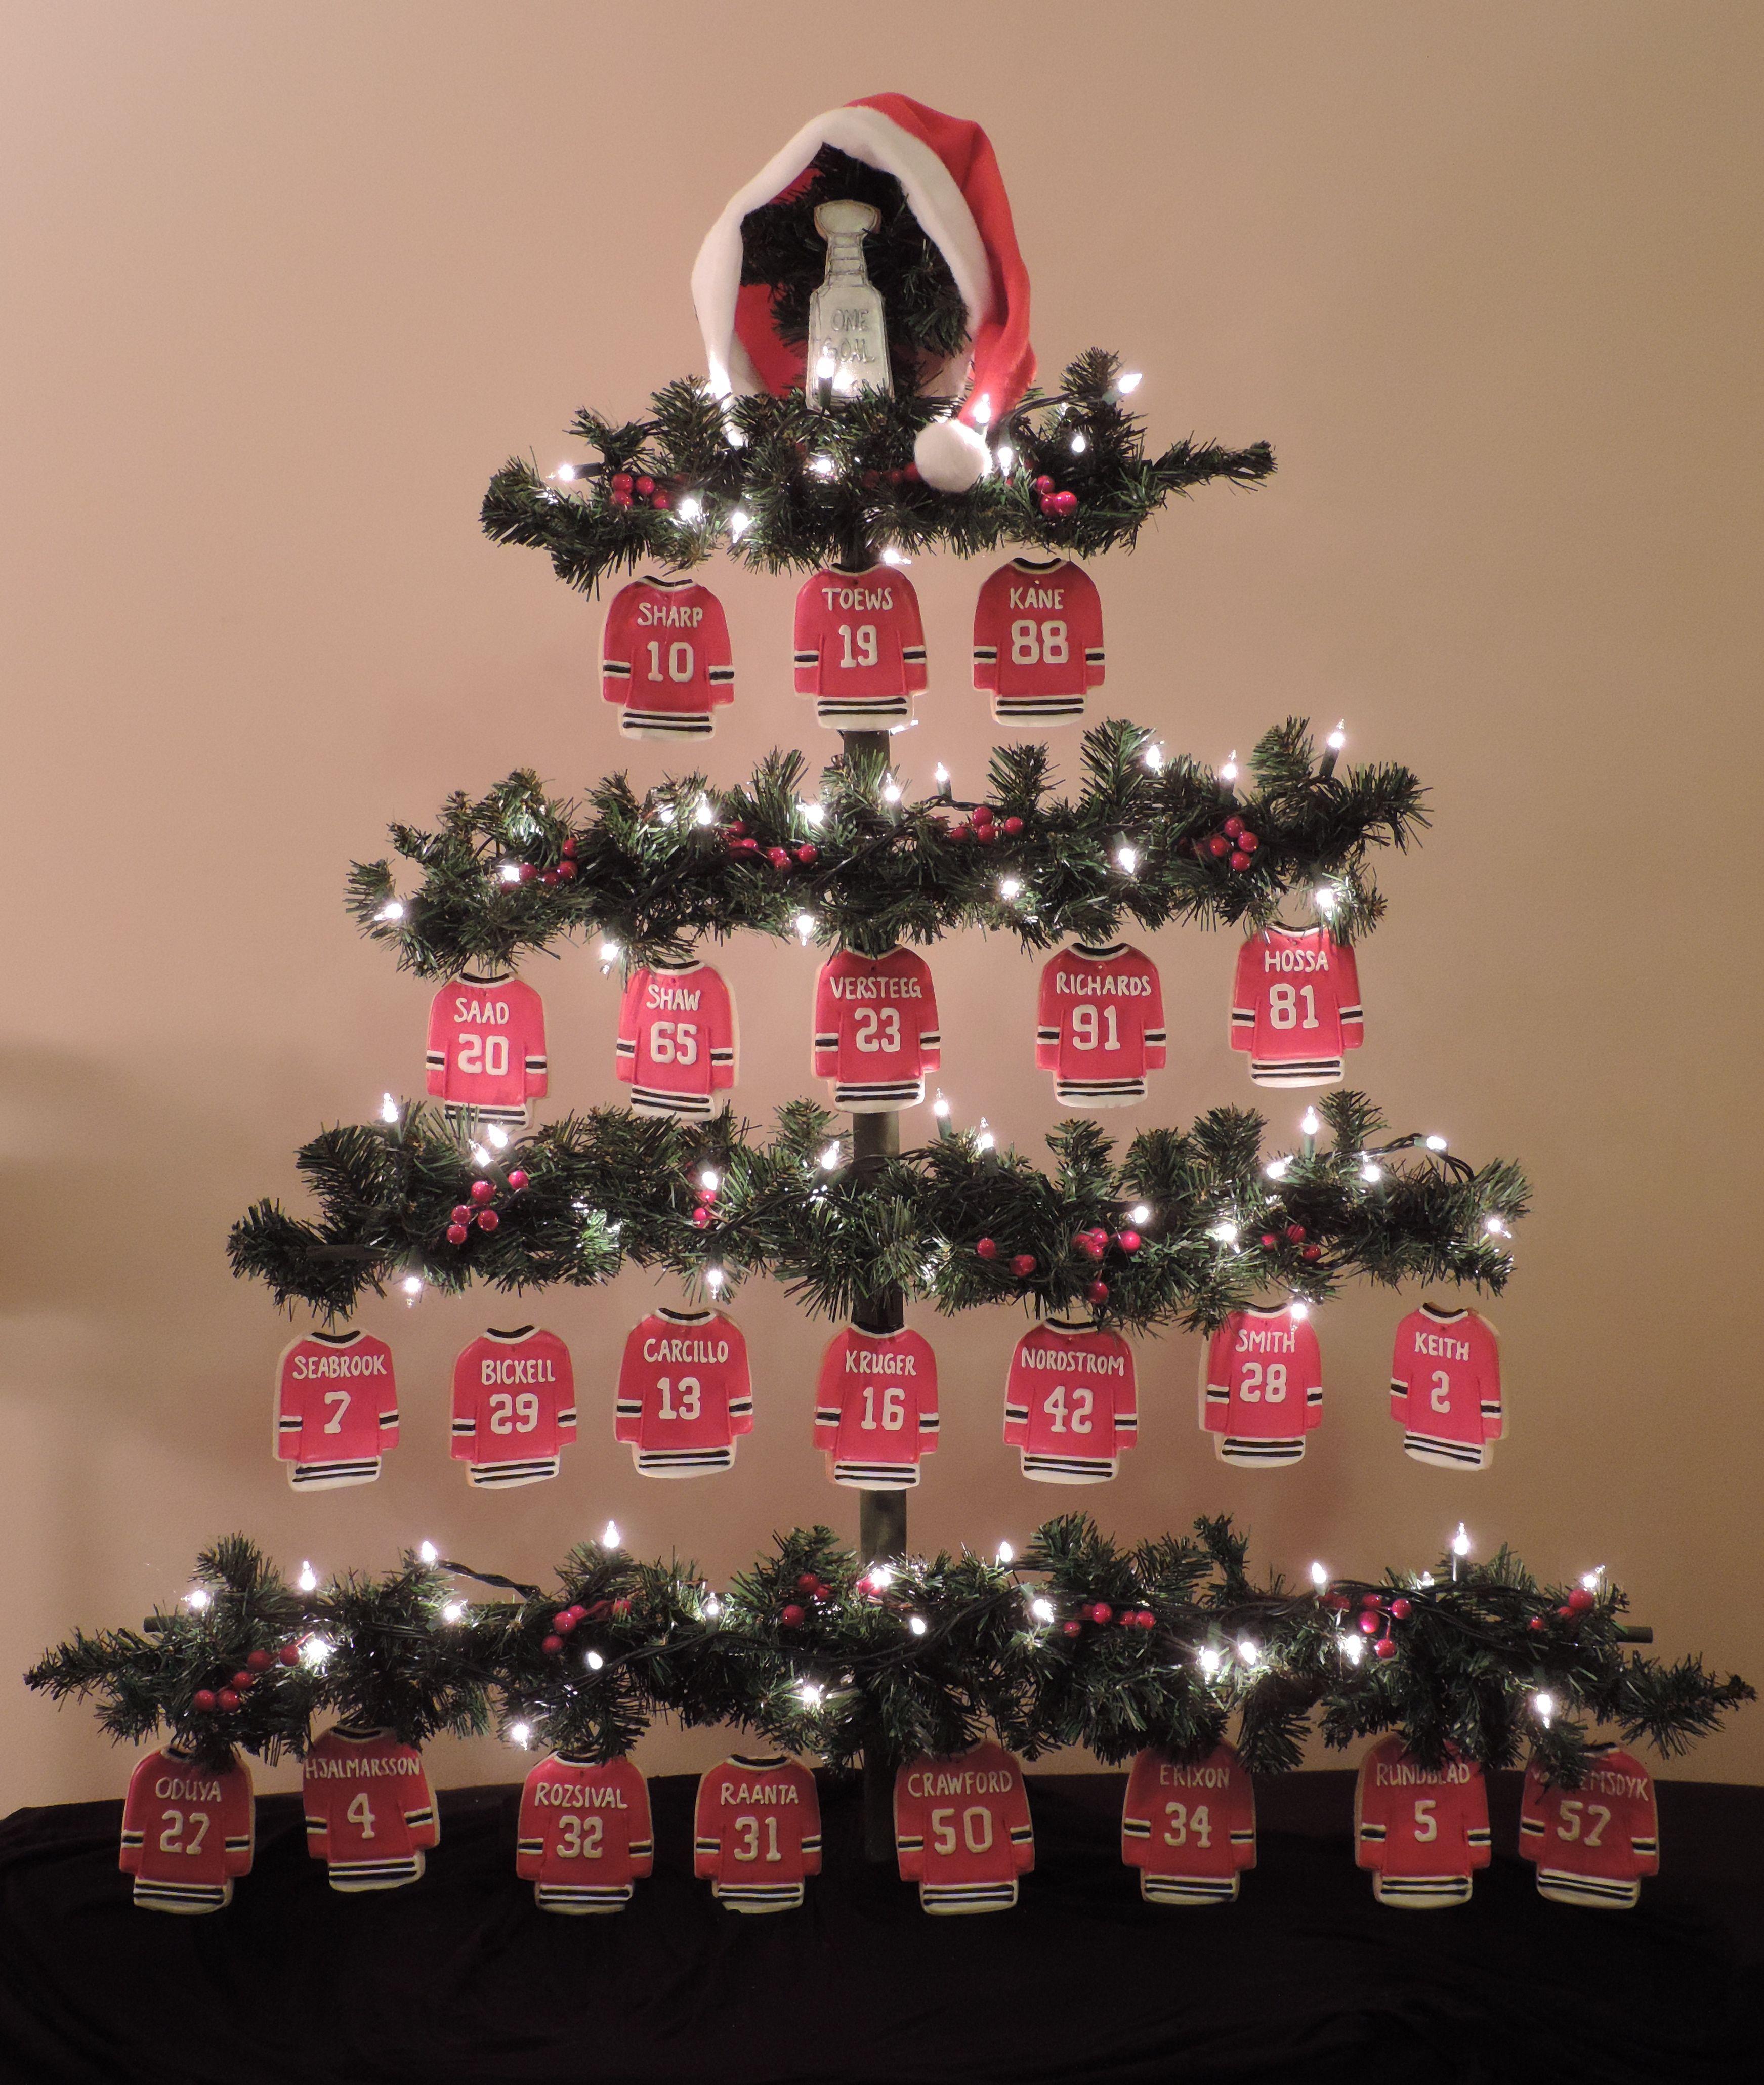 blackhawks jersey cookie christmas tree - Blackhawks Christmas